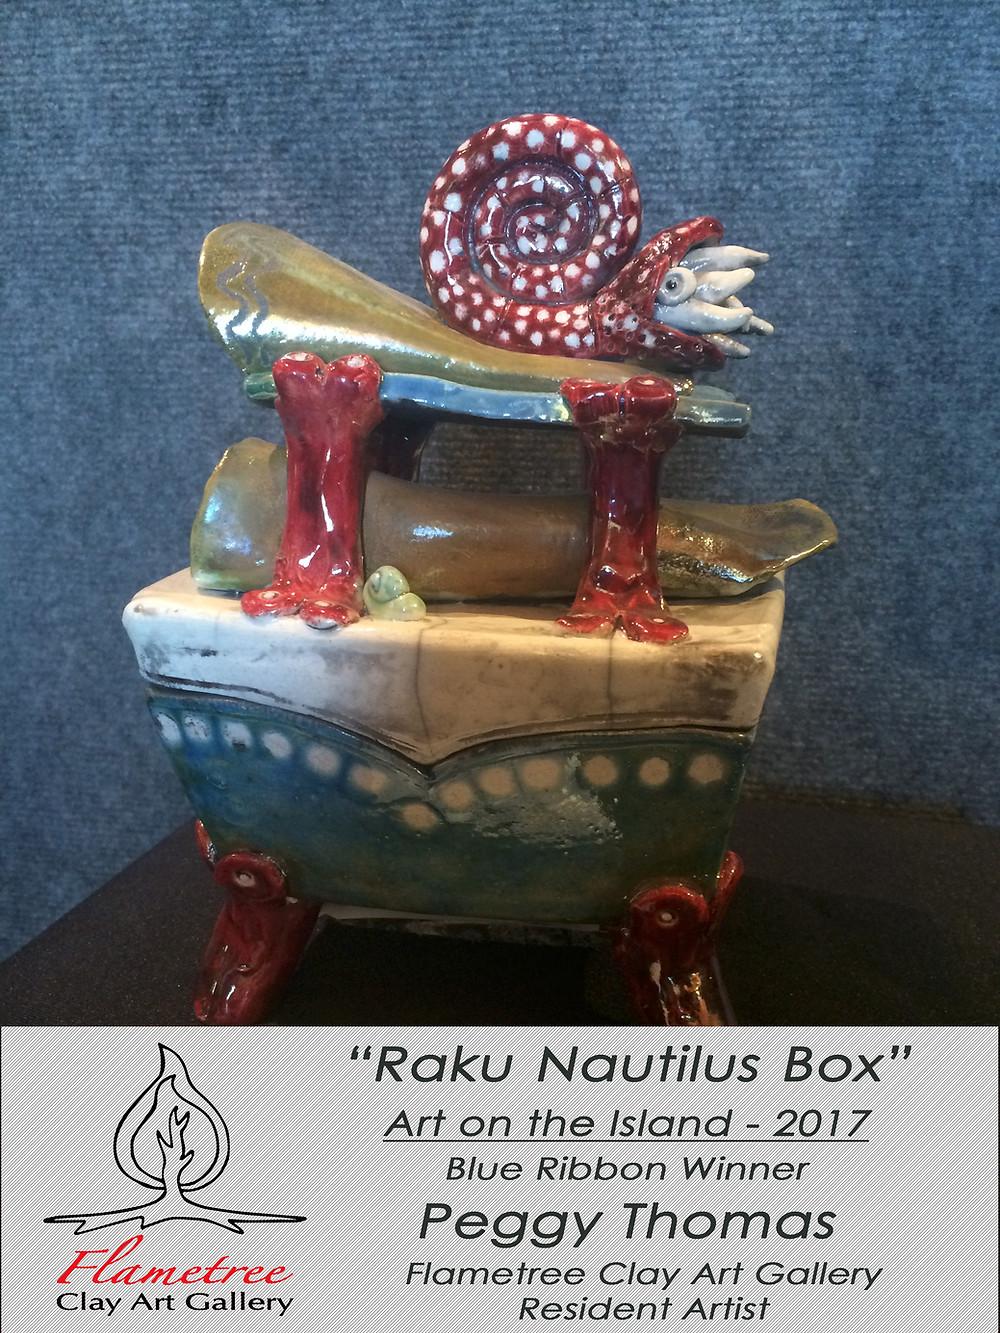 Raku Nautilus Box by Peggy Thomas - Resident Artist - Flametree Clay Art Gallery